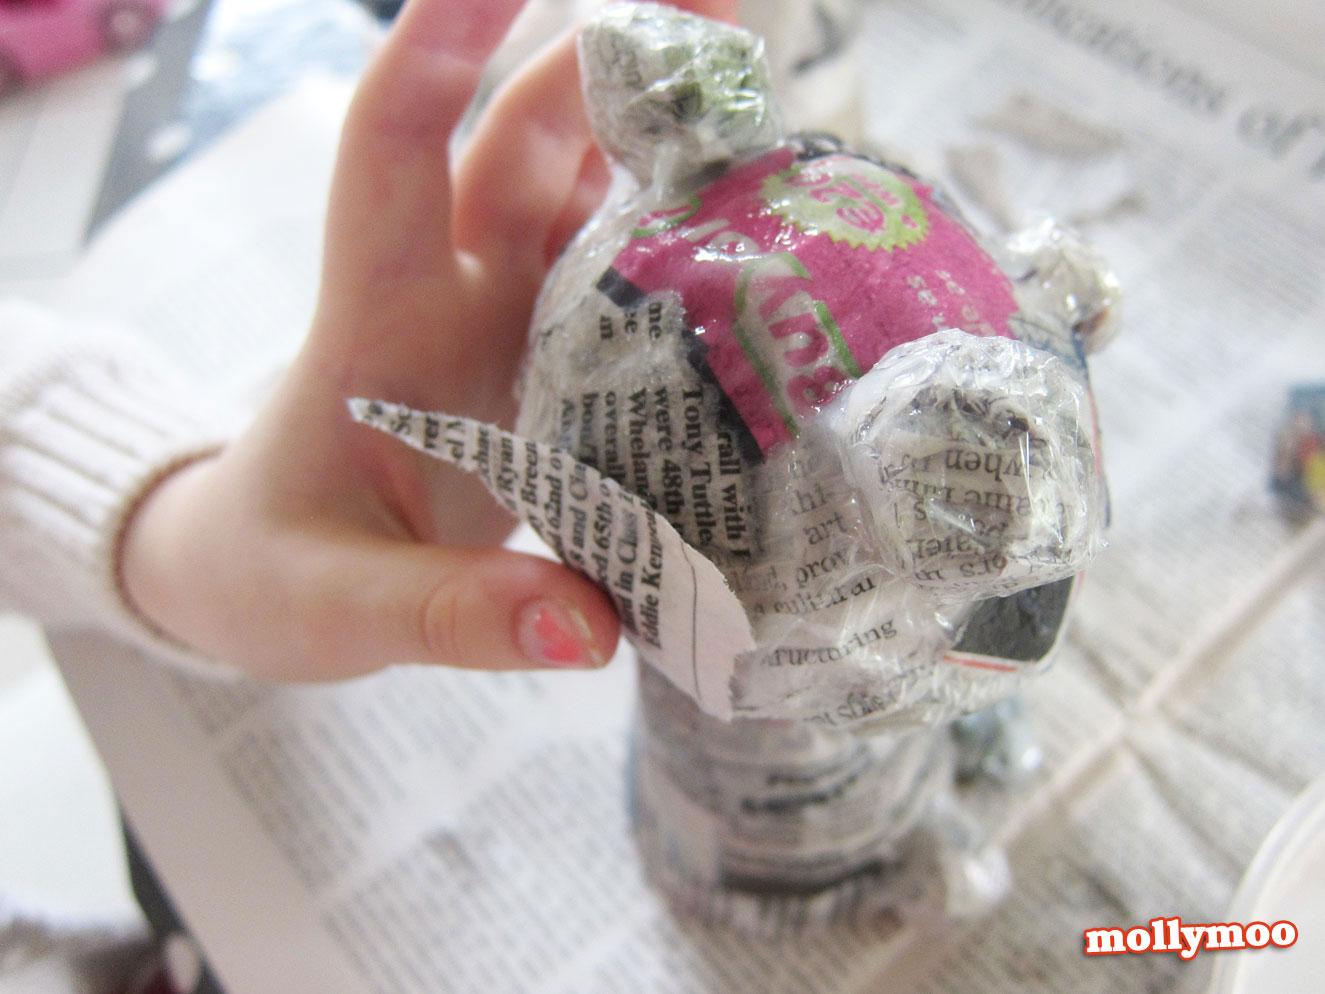 papier mache crafts for kids